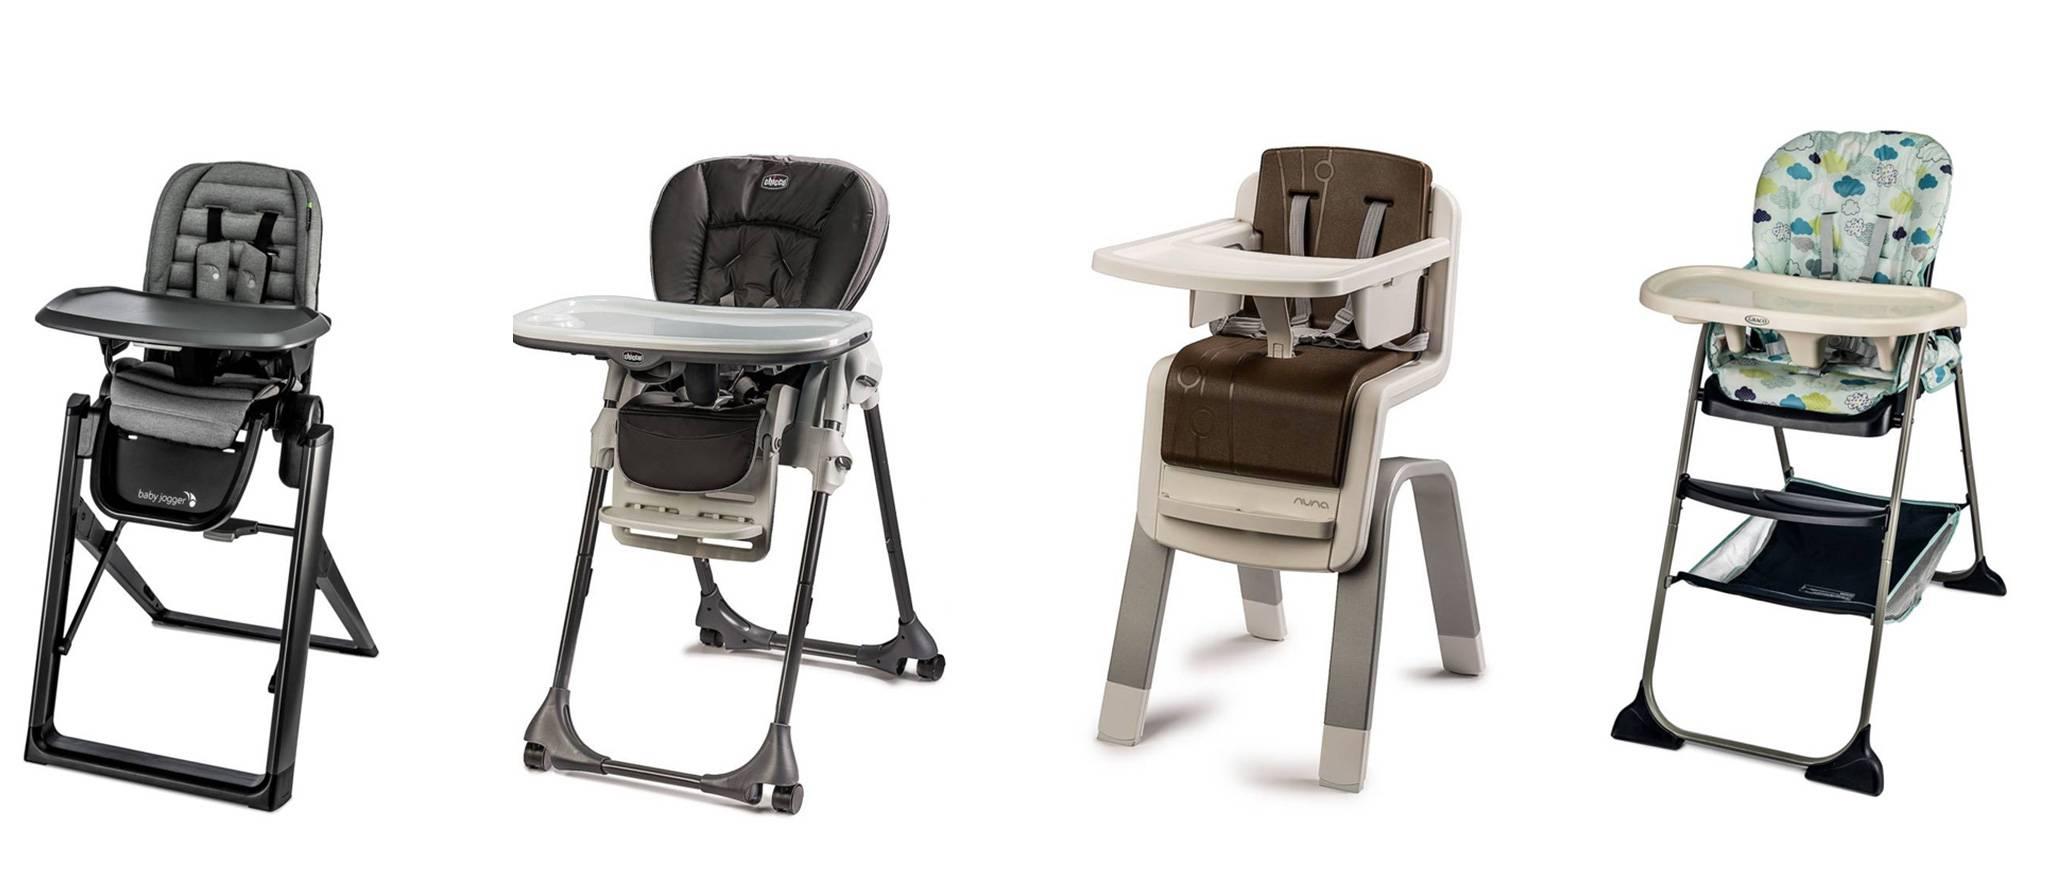 chaises-hautes-petits-espaces-2